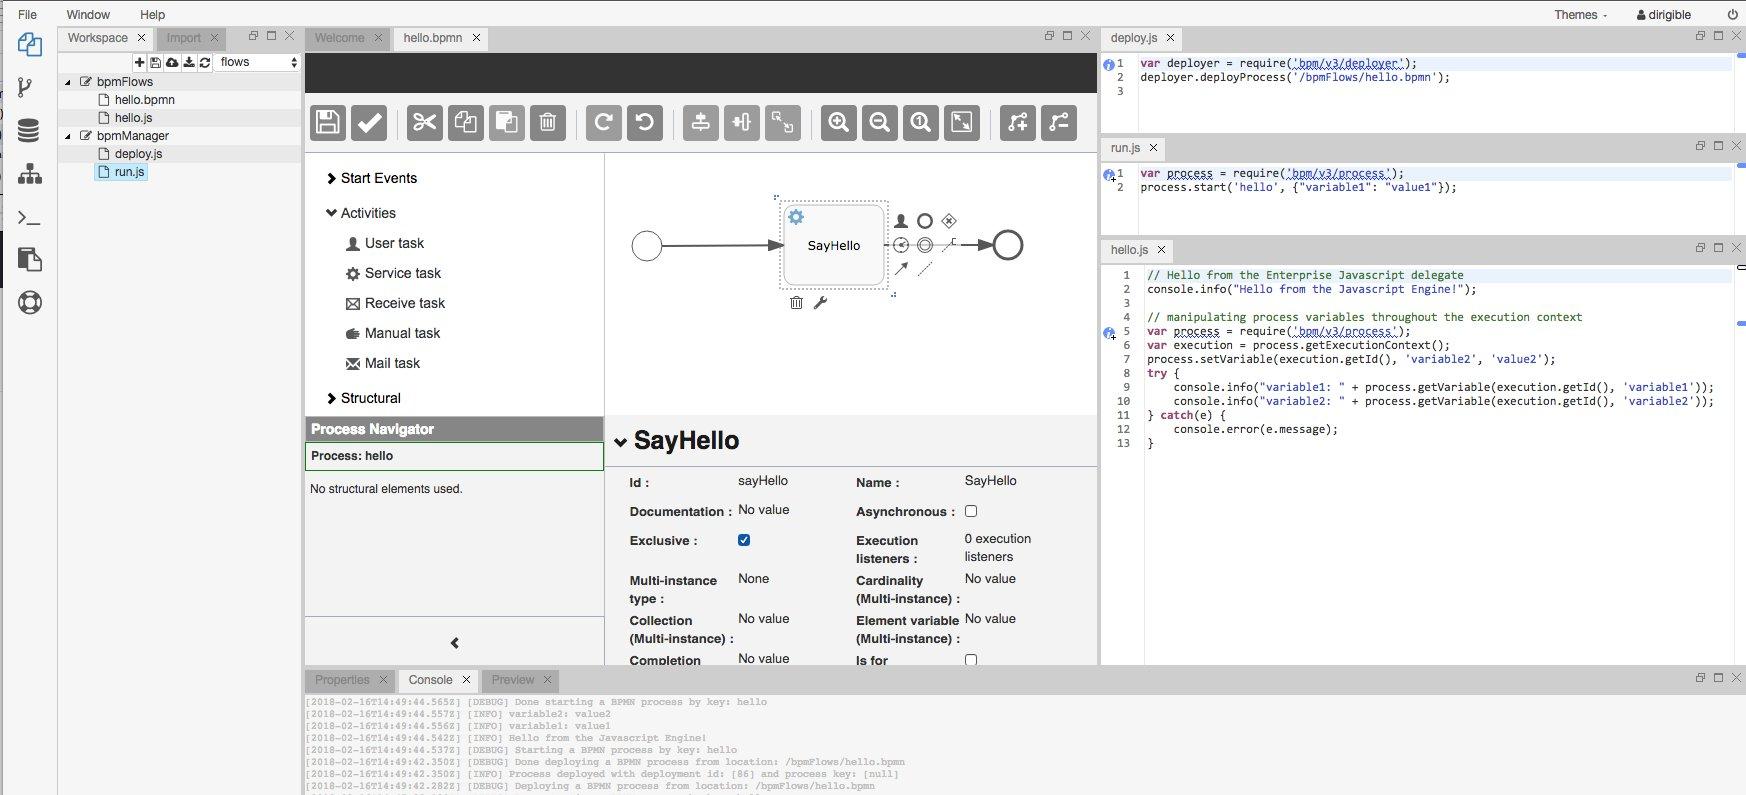 Eclipse Dirigible | Cloud Development Platform